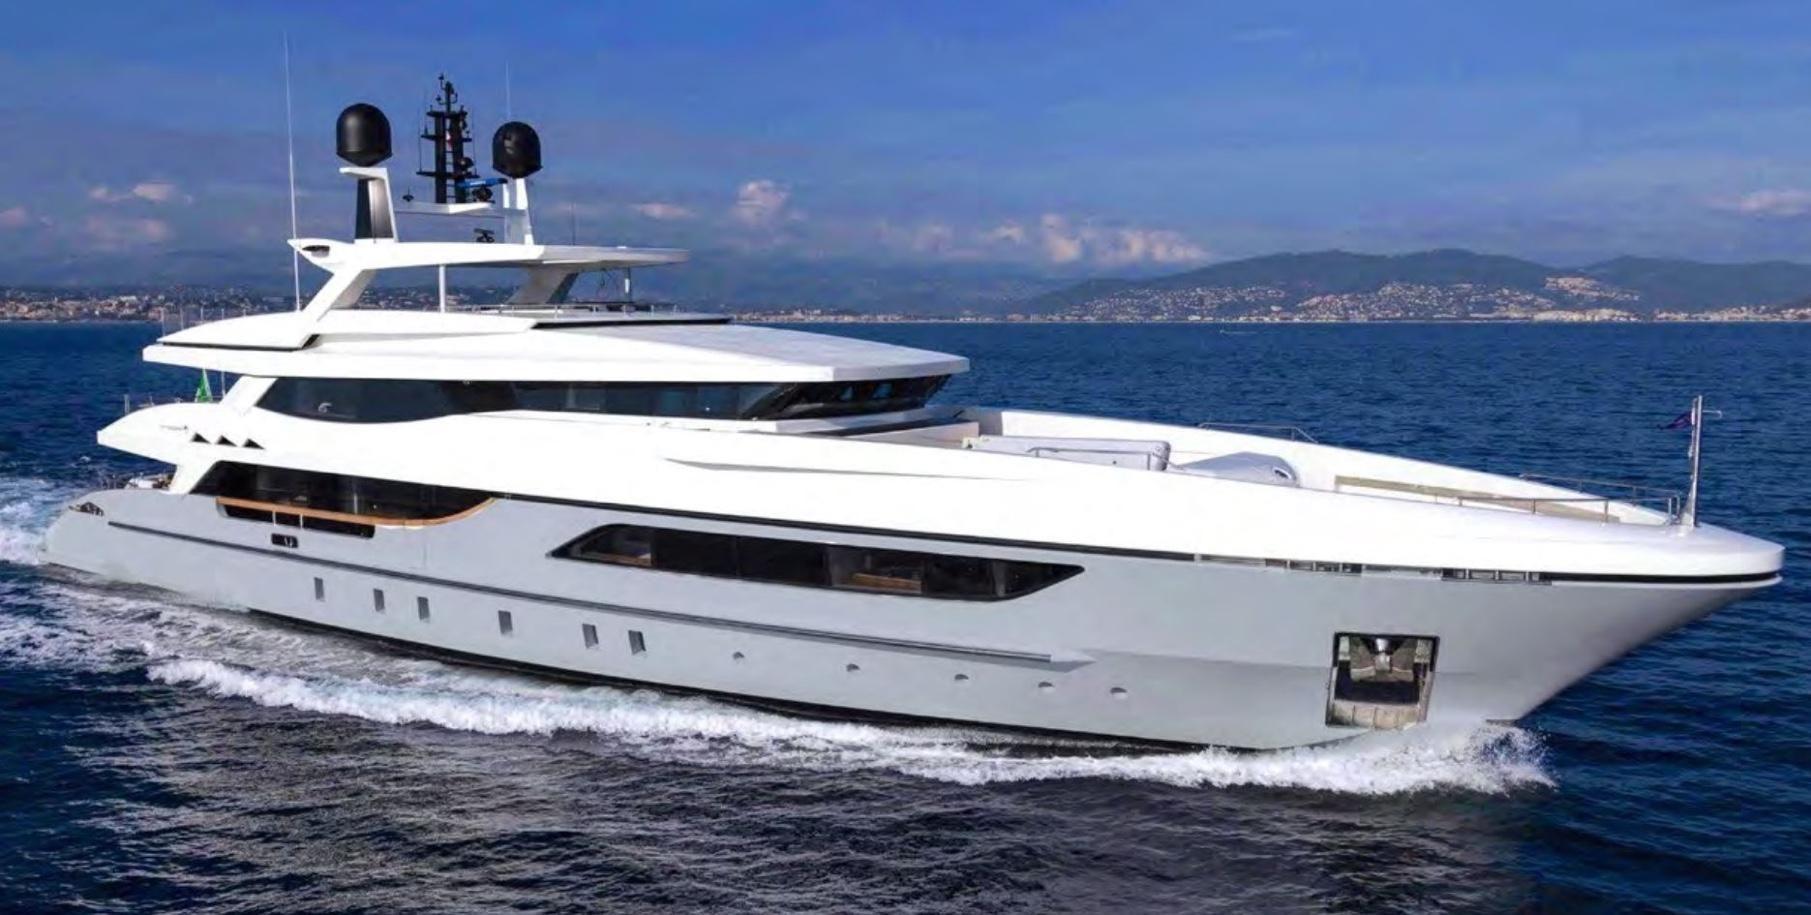 2015 baglietto 46 m luxury motor super yacht power new and used rh pinterest com